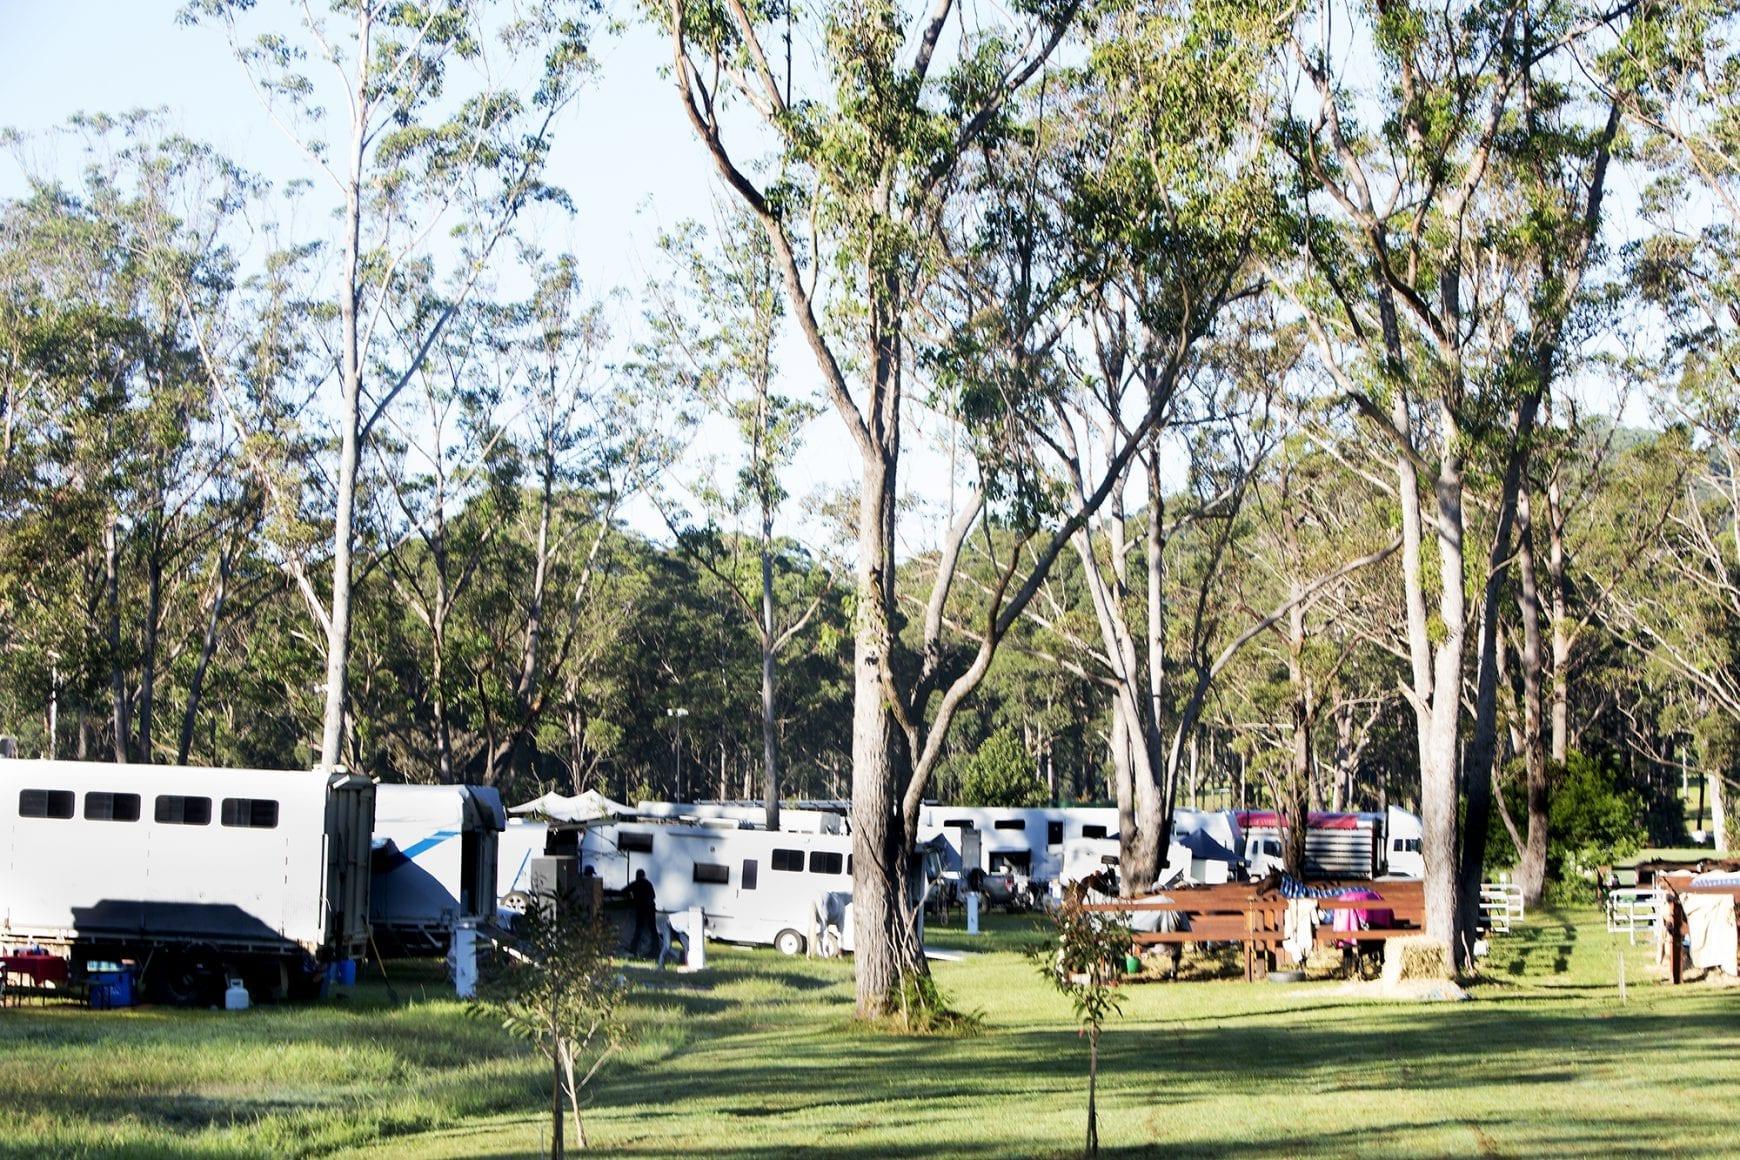 Caravans parked at Willinga